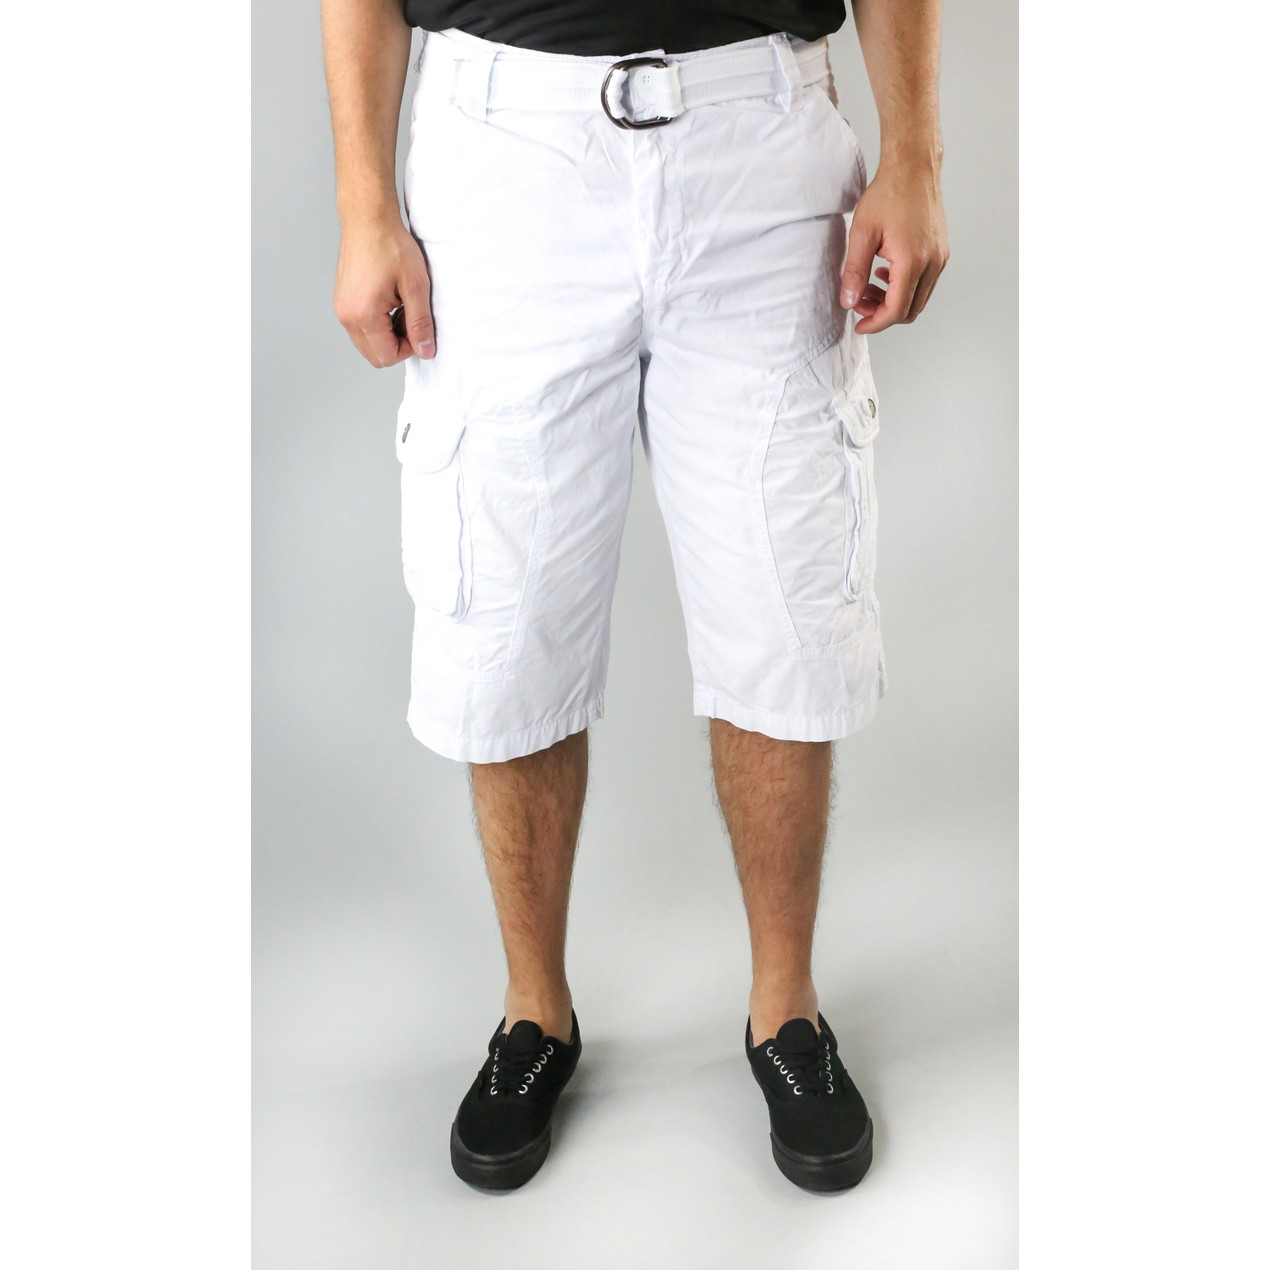 d054fbd5c5 ... Xray Jeans Men's Denver Cargo Shorts ...